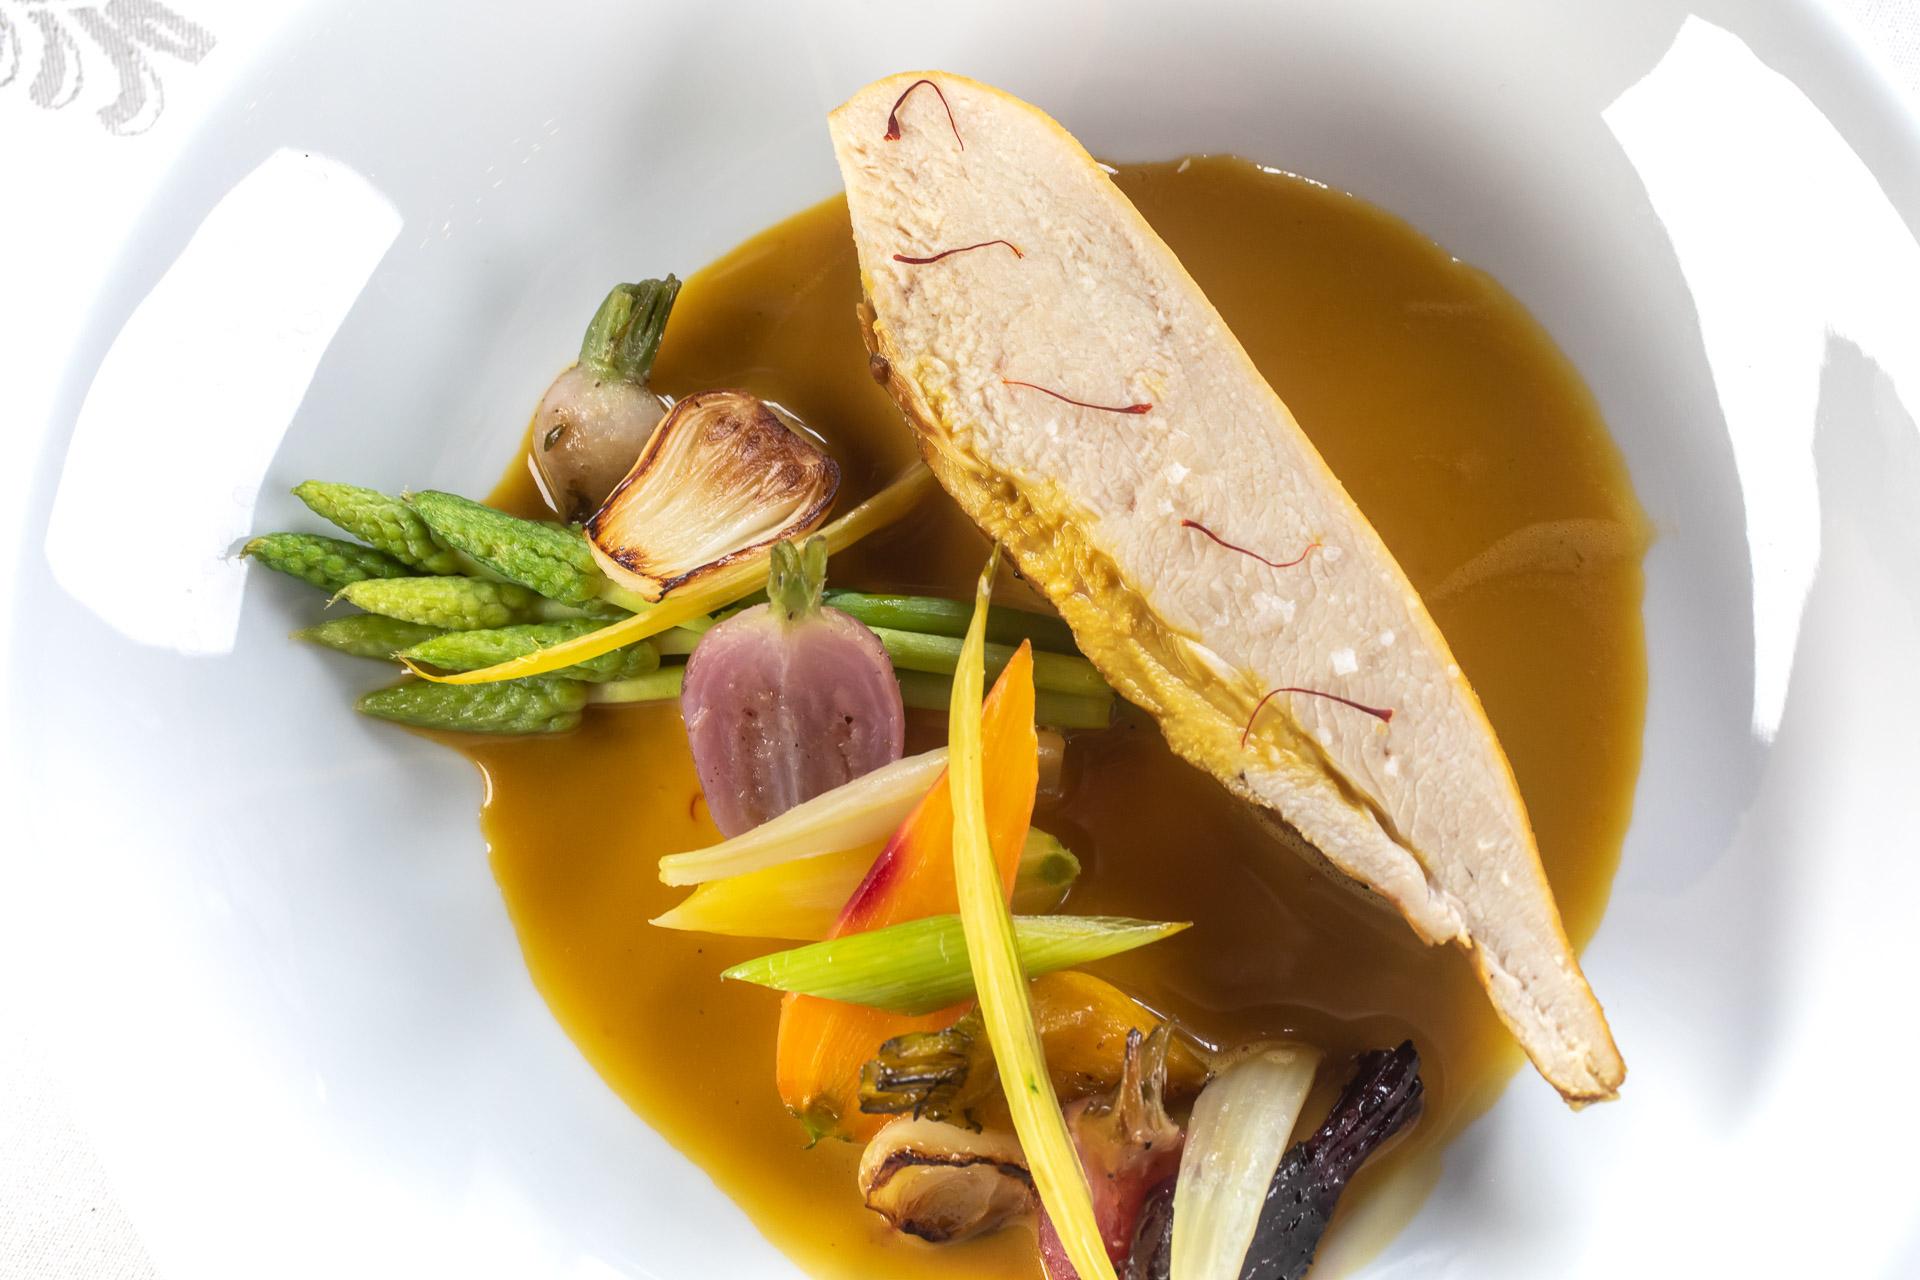 chef-poisot-mercues-2018-1.jpg